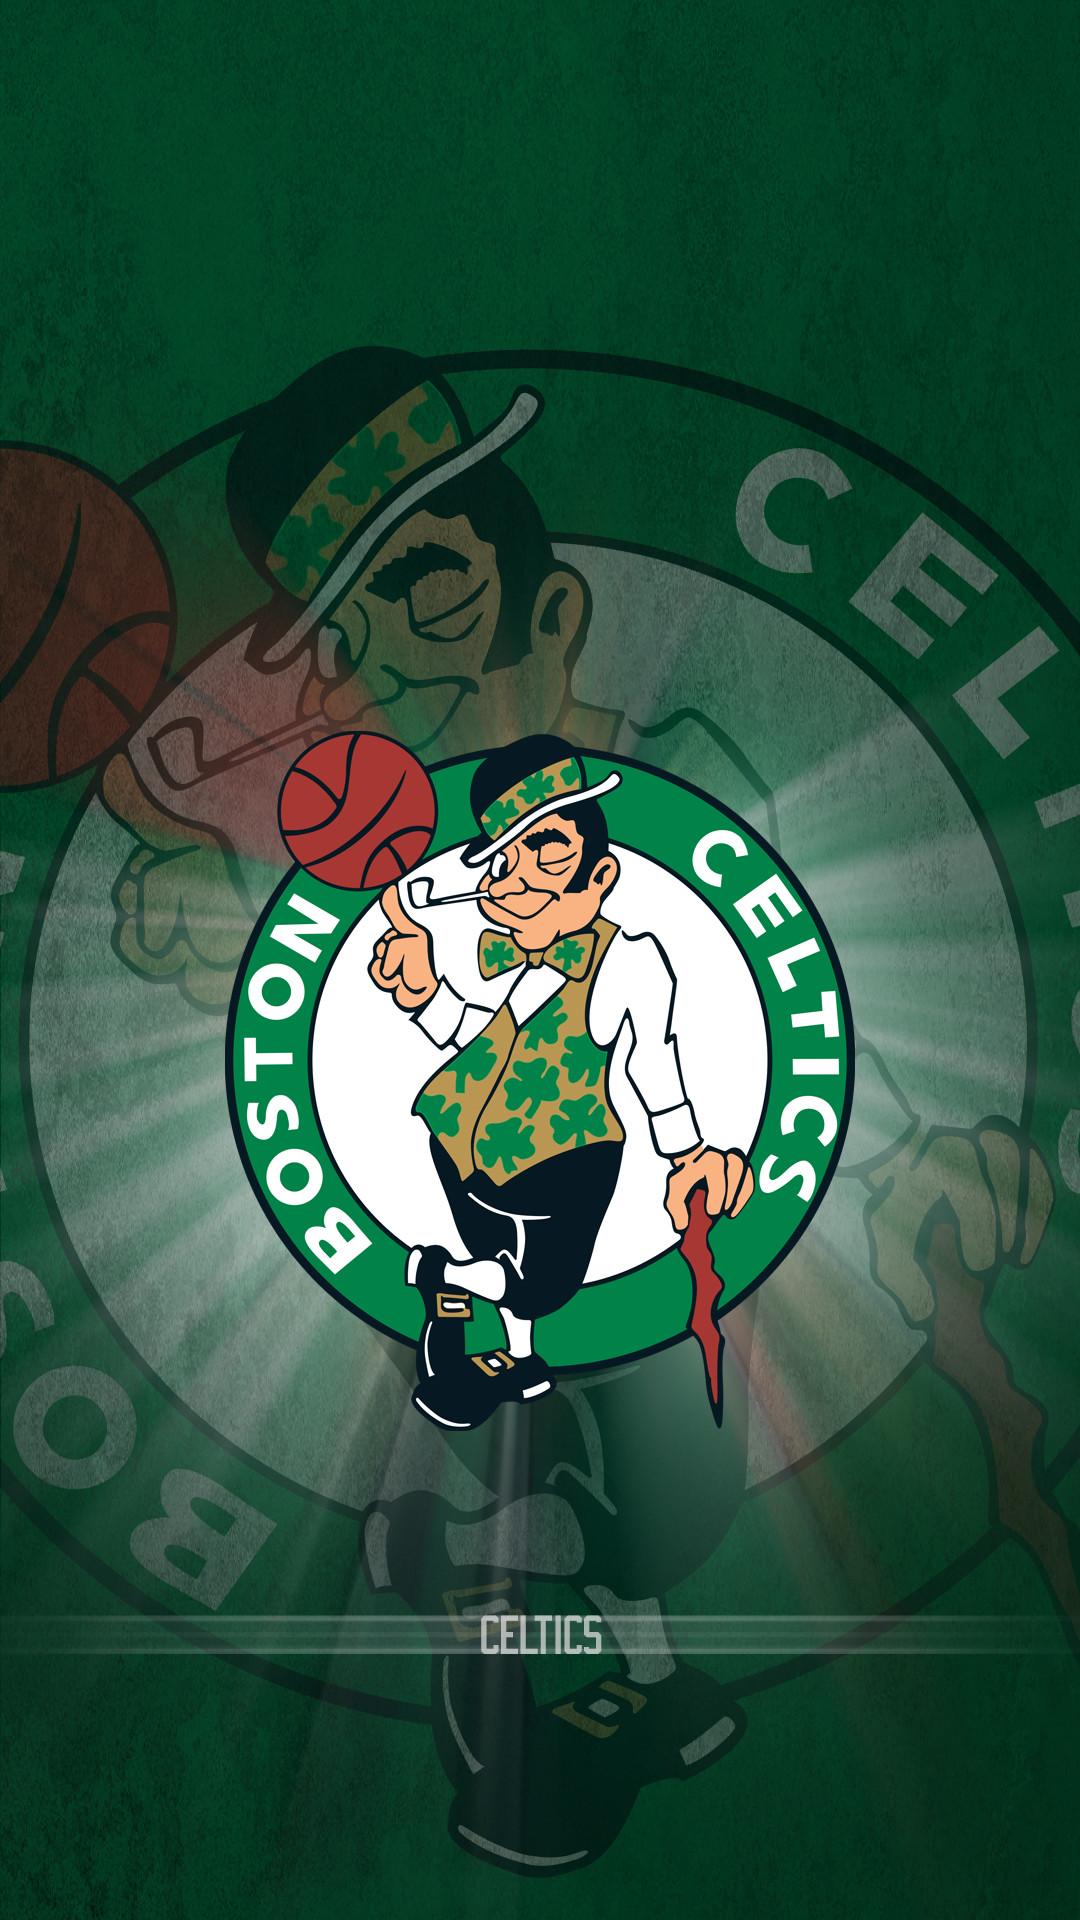 Okc Wallpaper Iphone Boston Celtics Iphone Wallpaper 66 Images